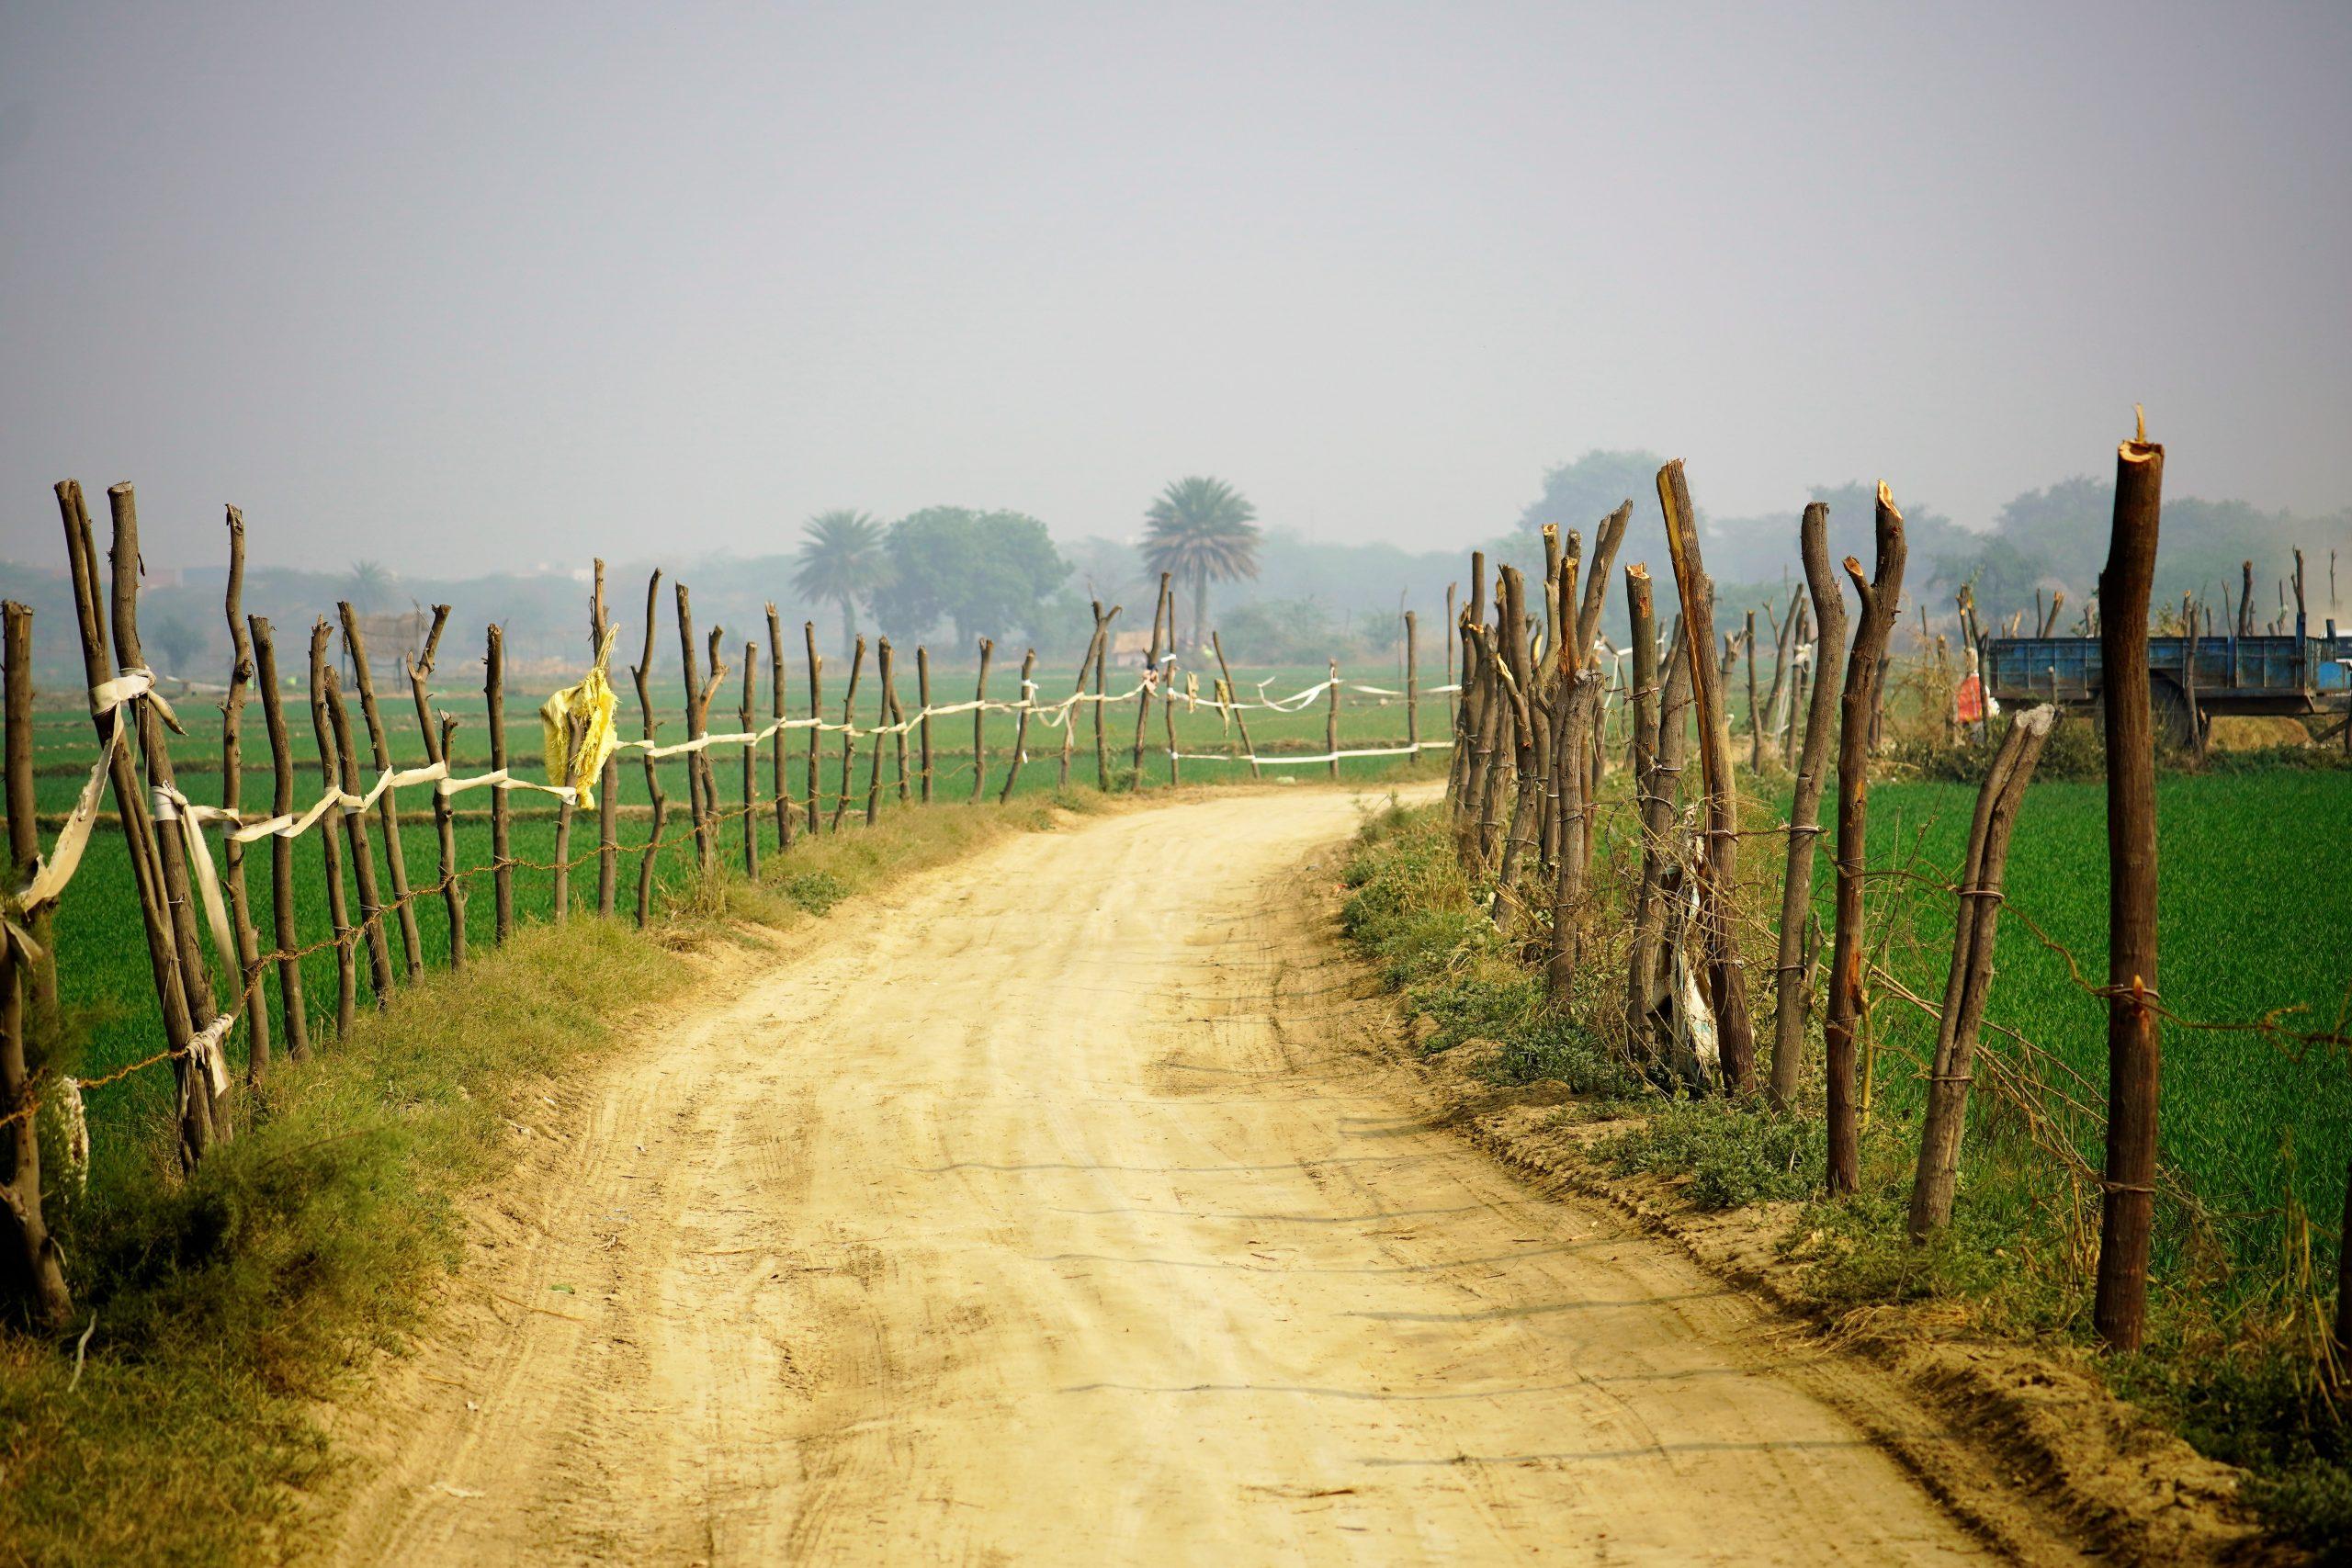 Greater Noida Farms field